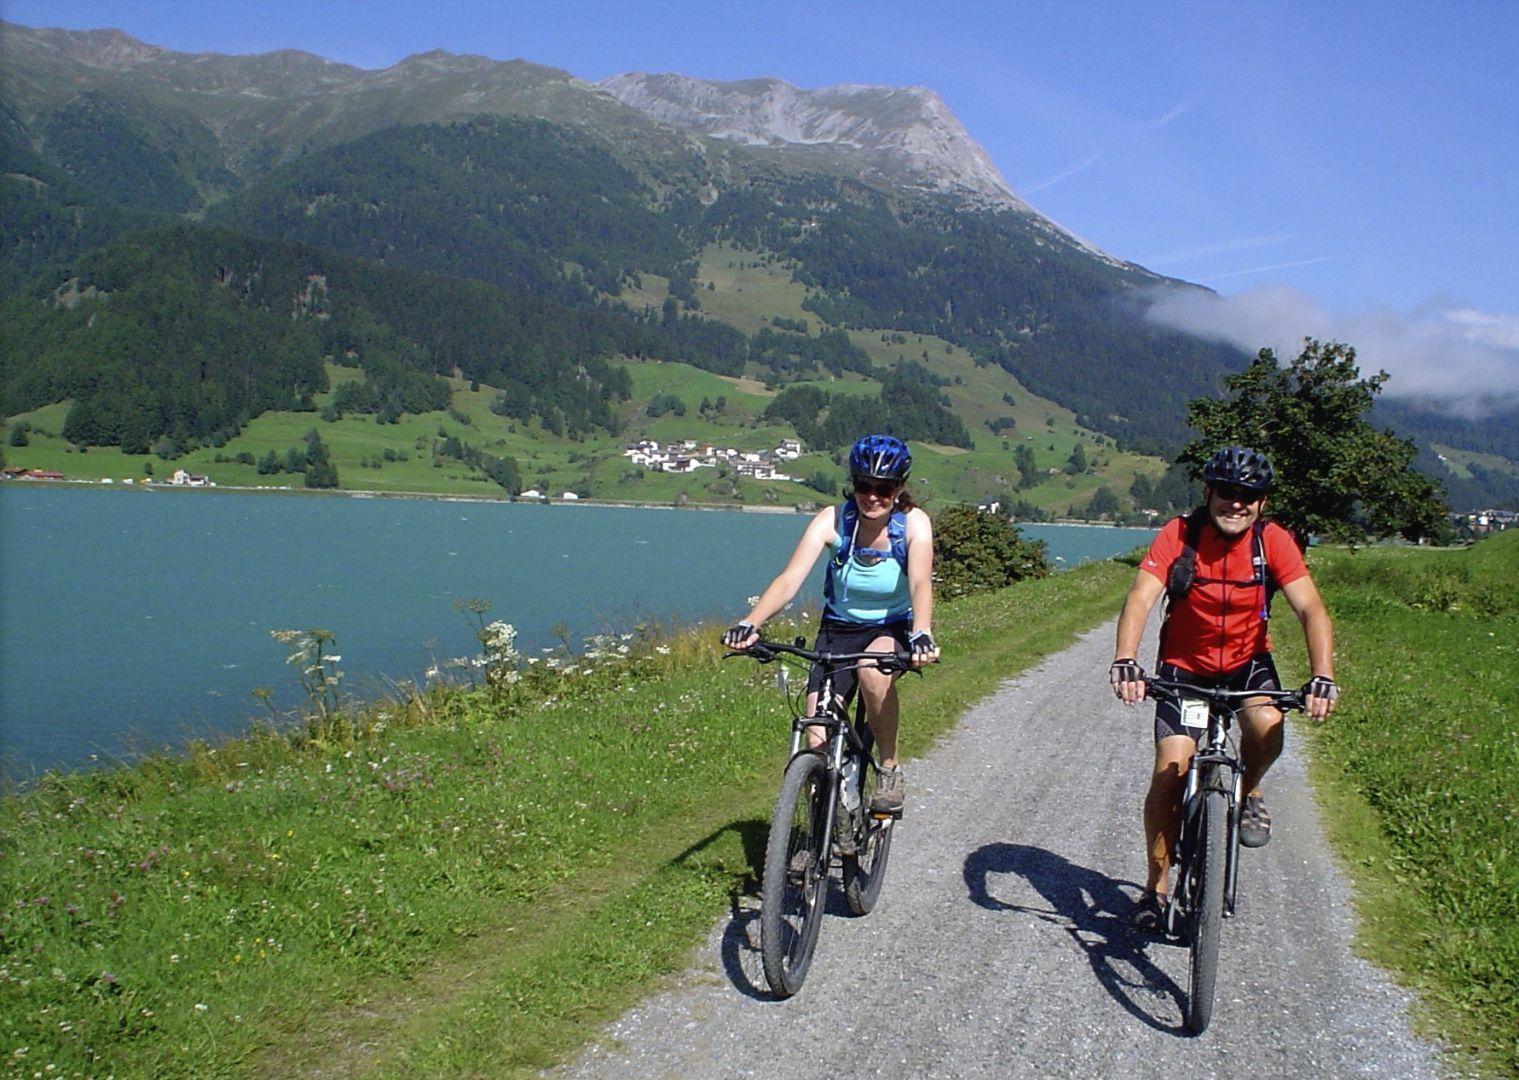 leisurecyclingaustria4.jpg - Austria - Ten Lakes Tour - Self-Guided Leisure Cycling Holiday - Leisure Cycling